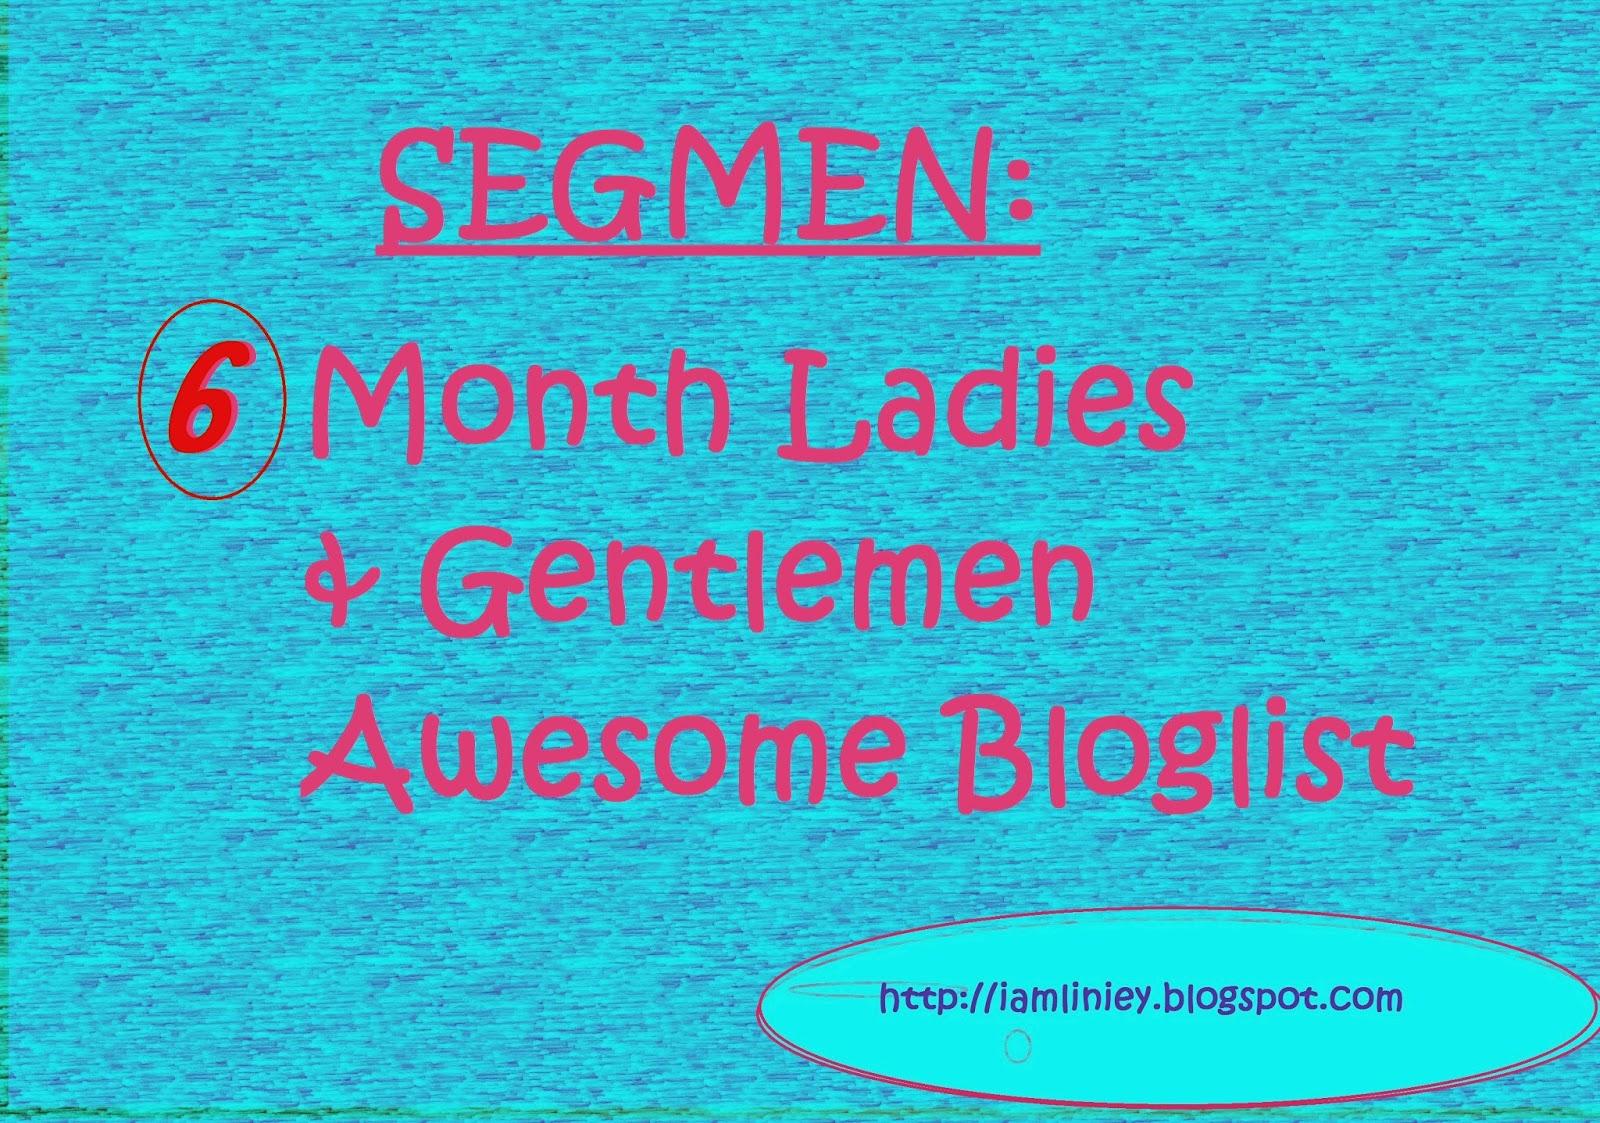 http://iamliniey.blogspot.com/2013/12/segmen-6-month-ladies-gentlemen-awesome.html#